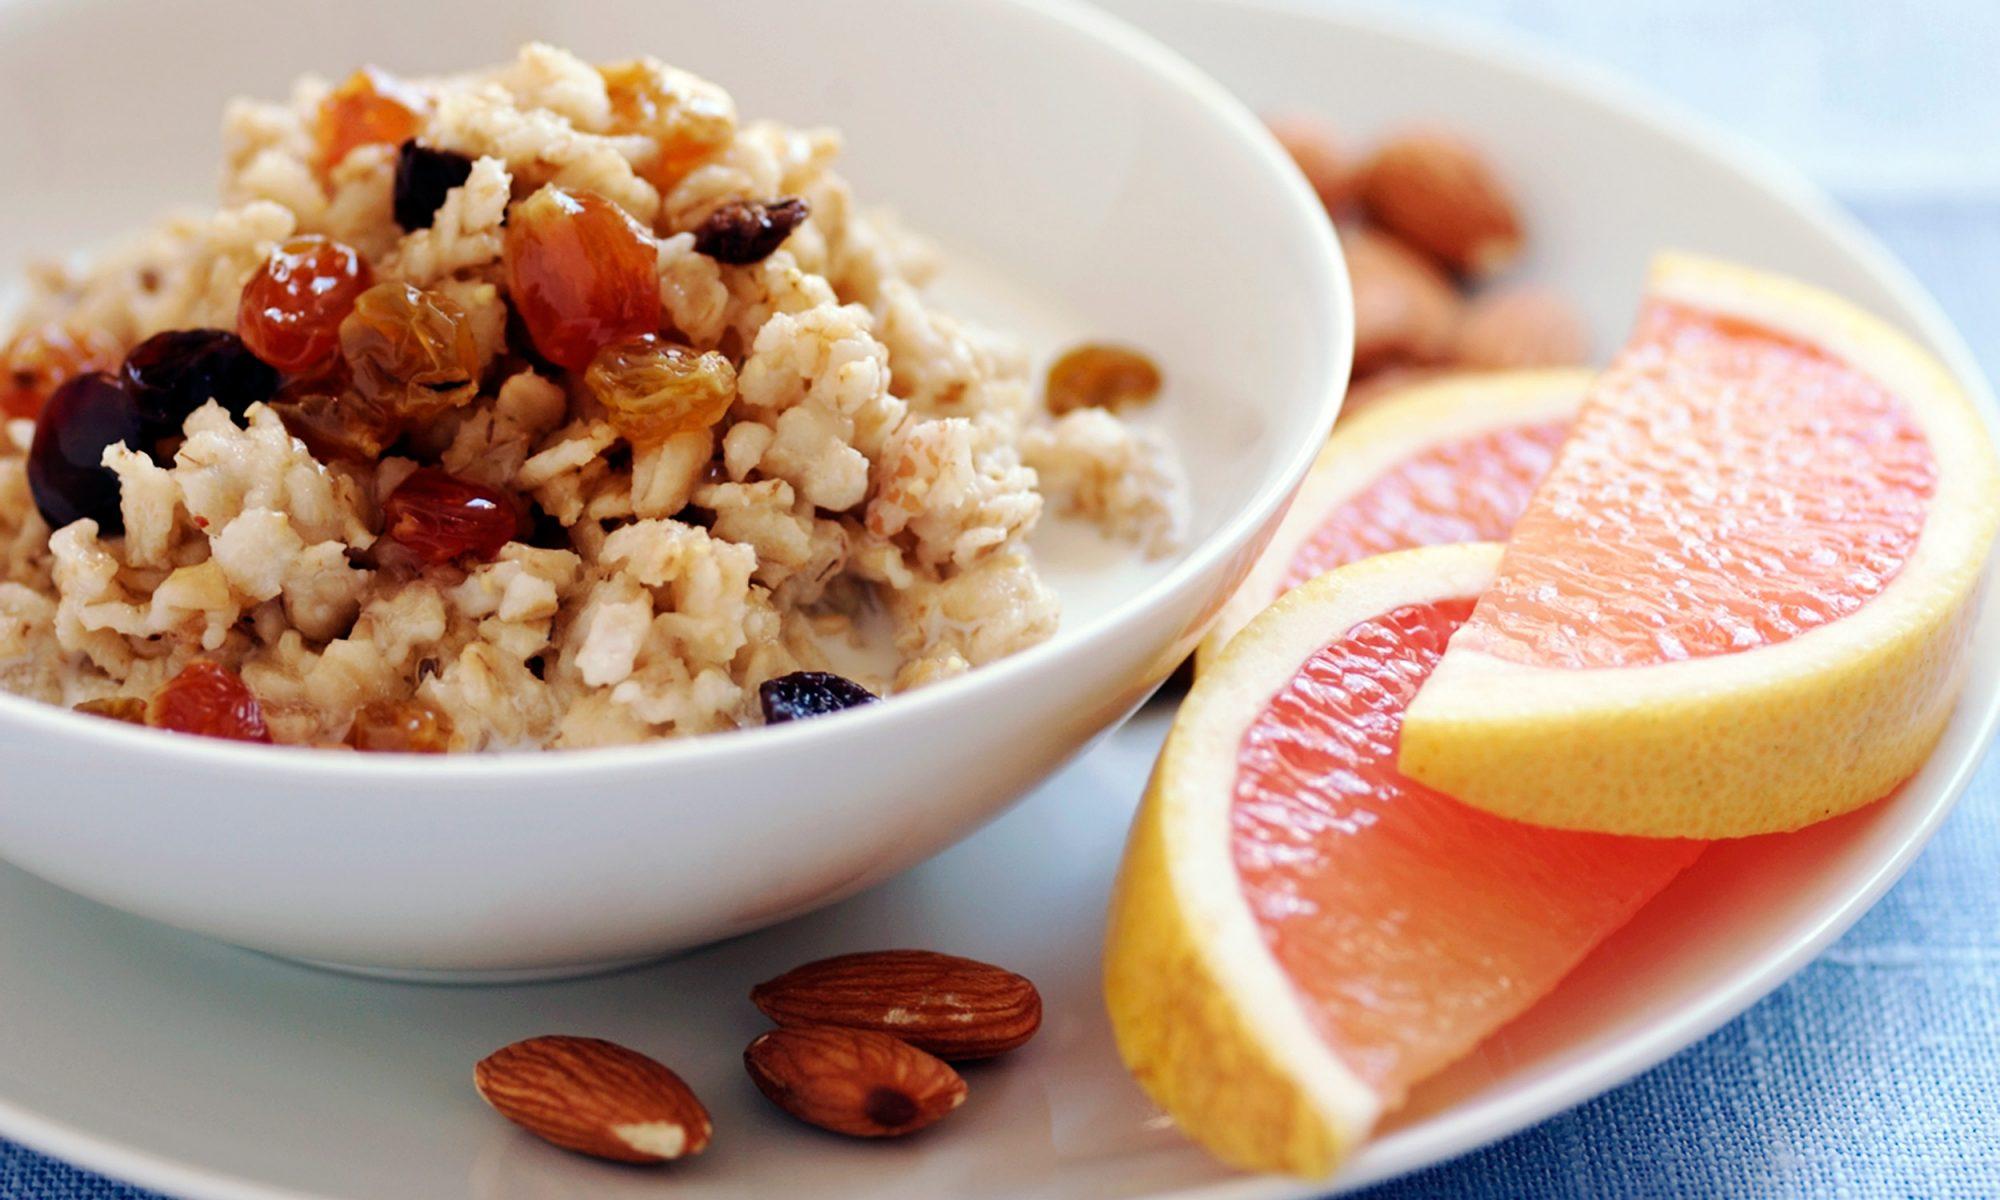 EC: 5 Breakfast Foods to Prevent the Mid-Afternoon Slump